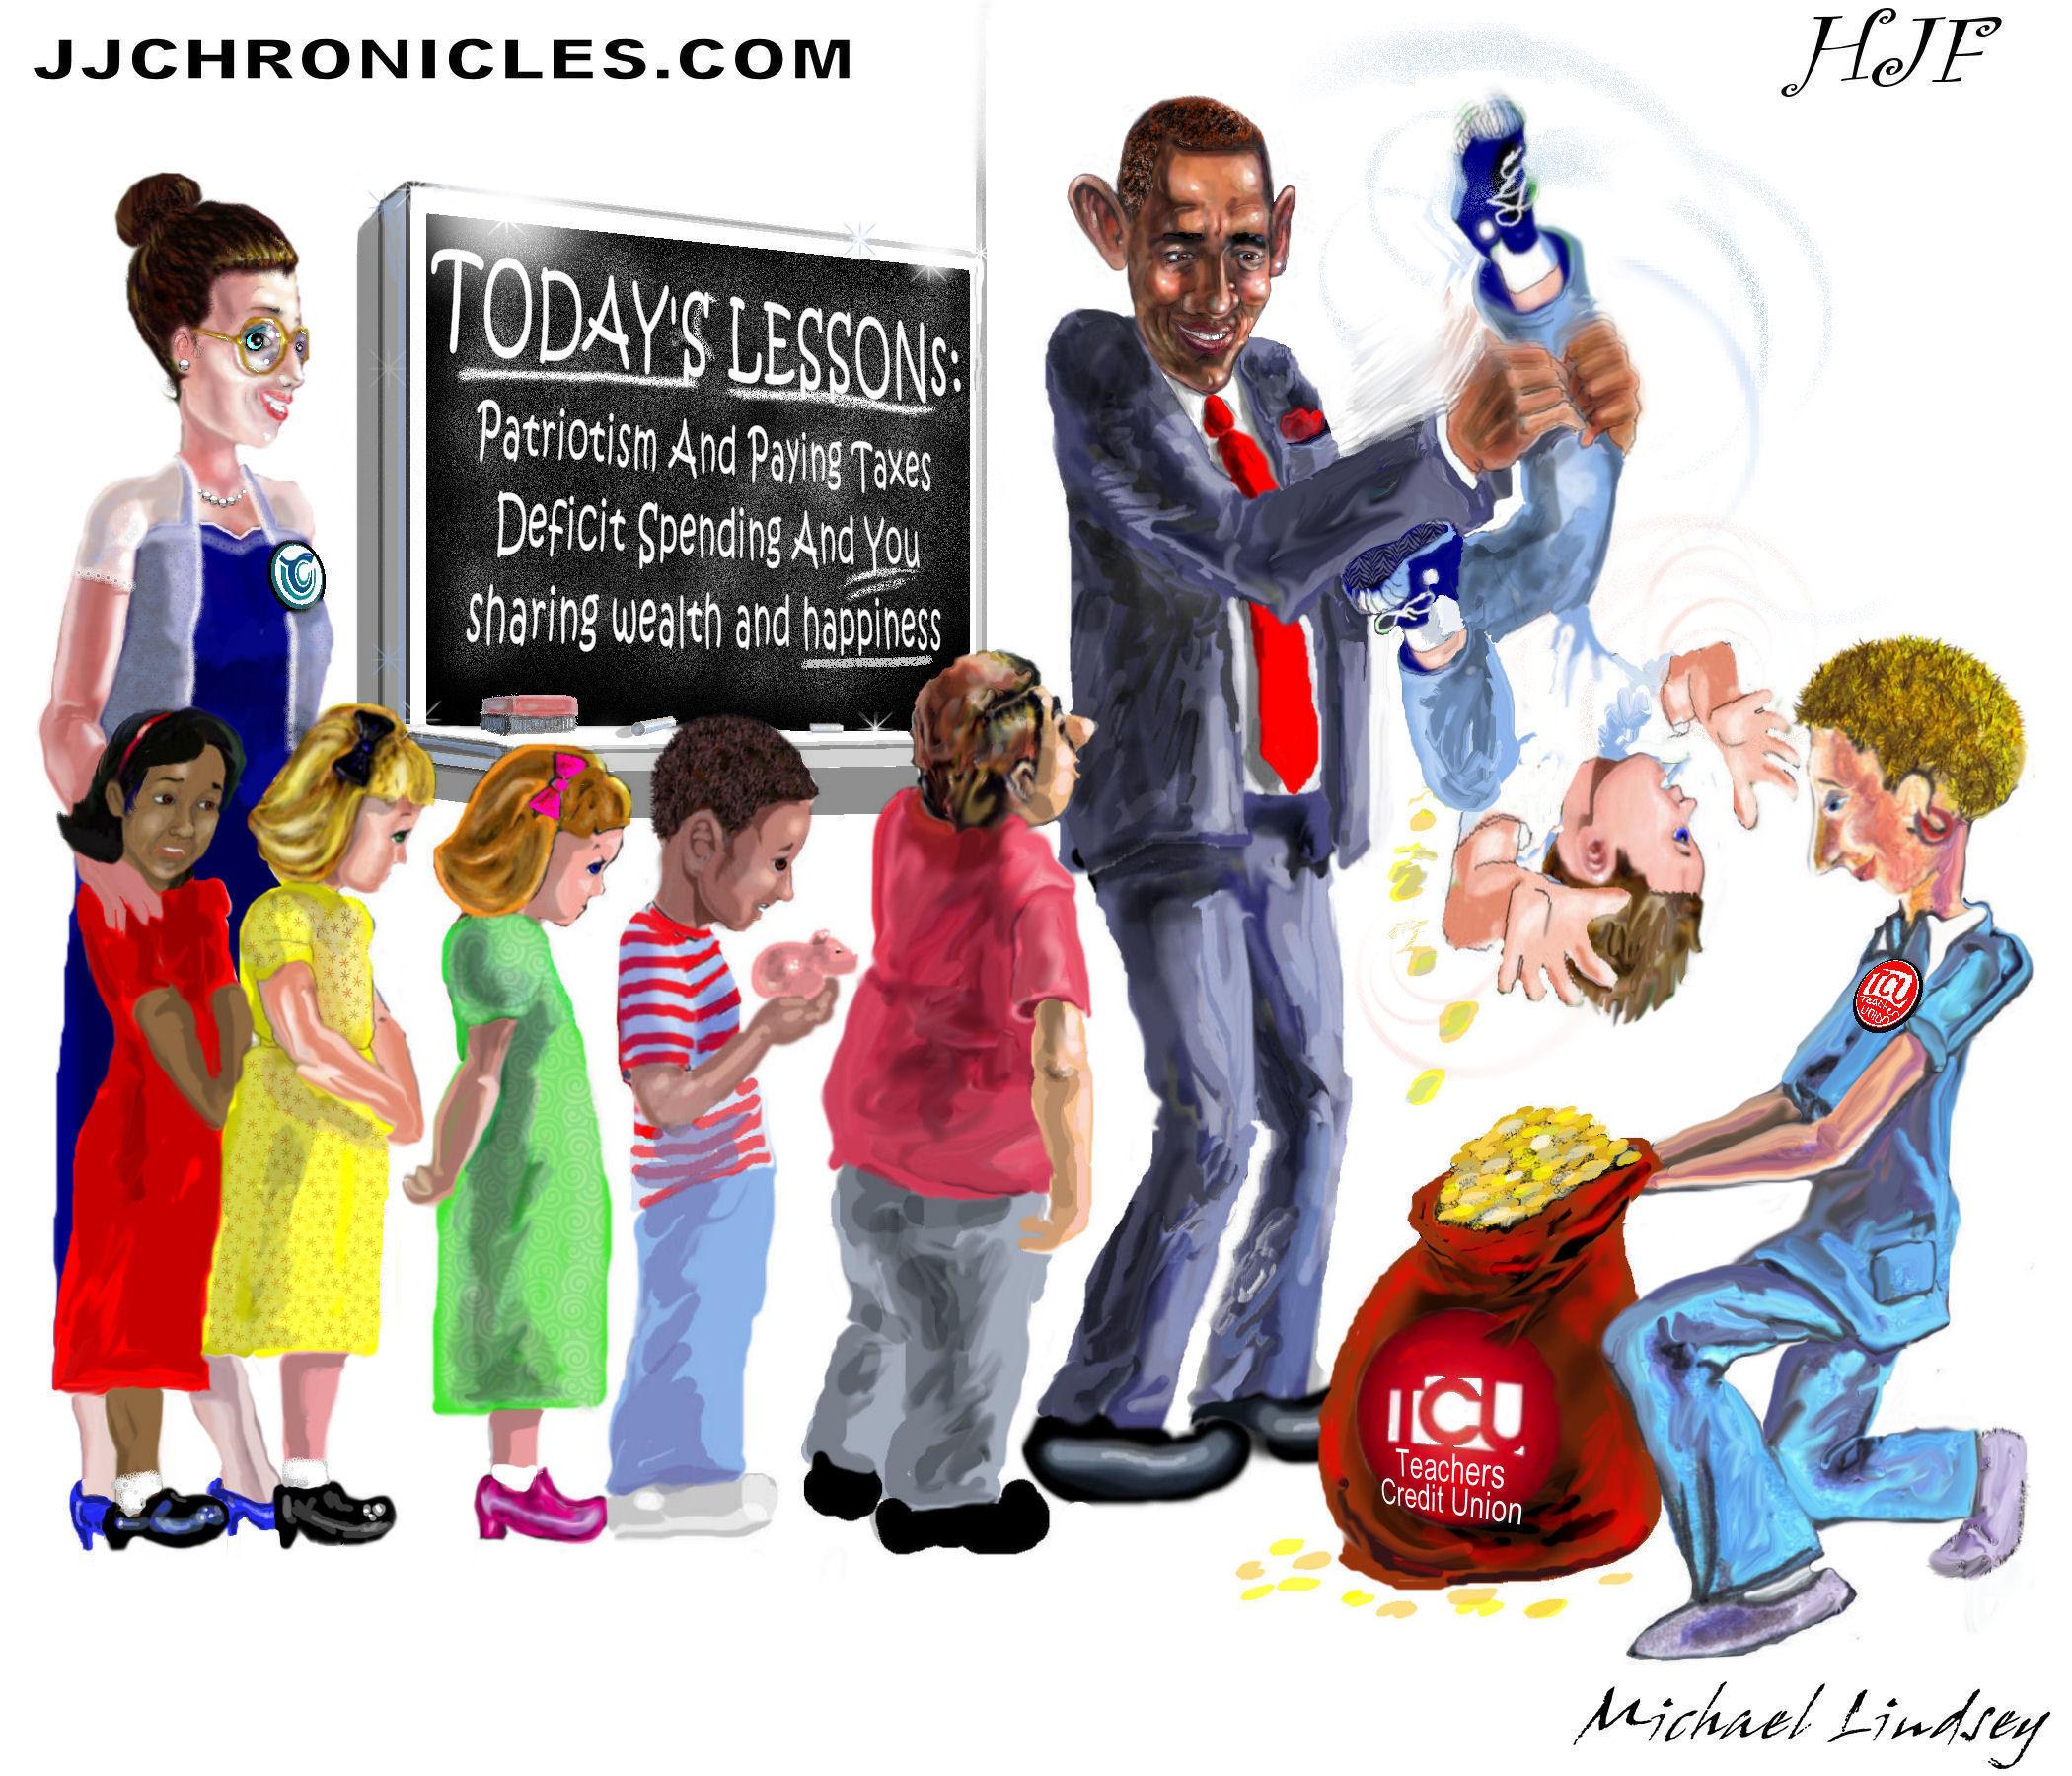 obama-shaking-money-out-of-child-23